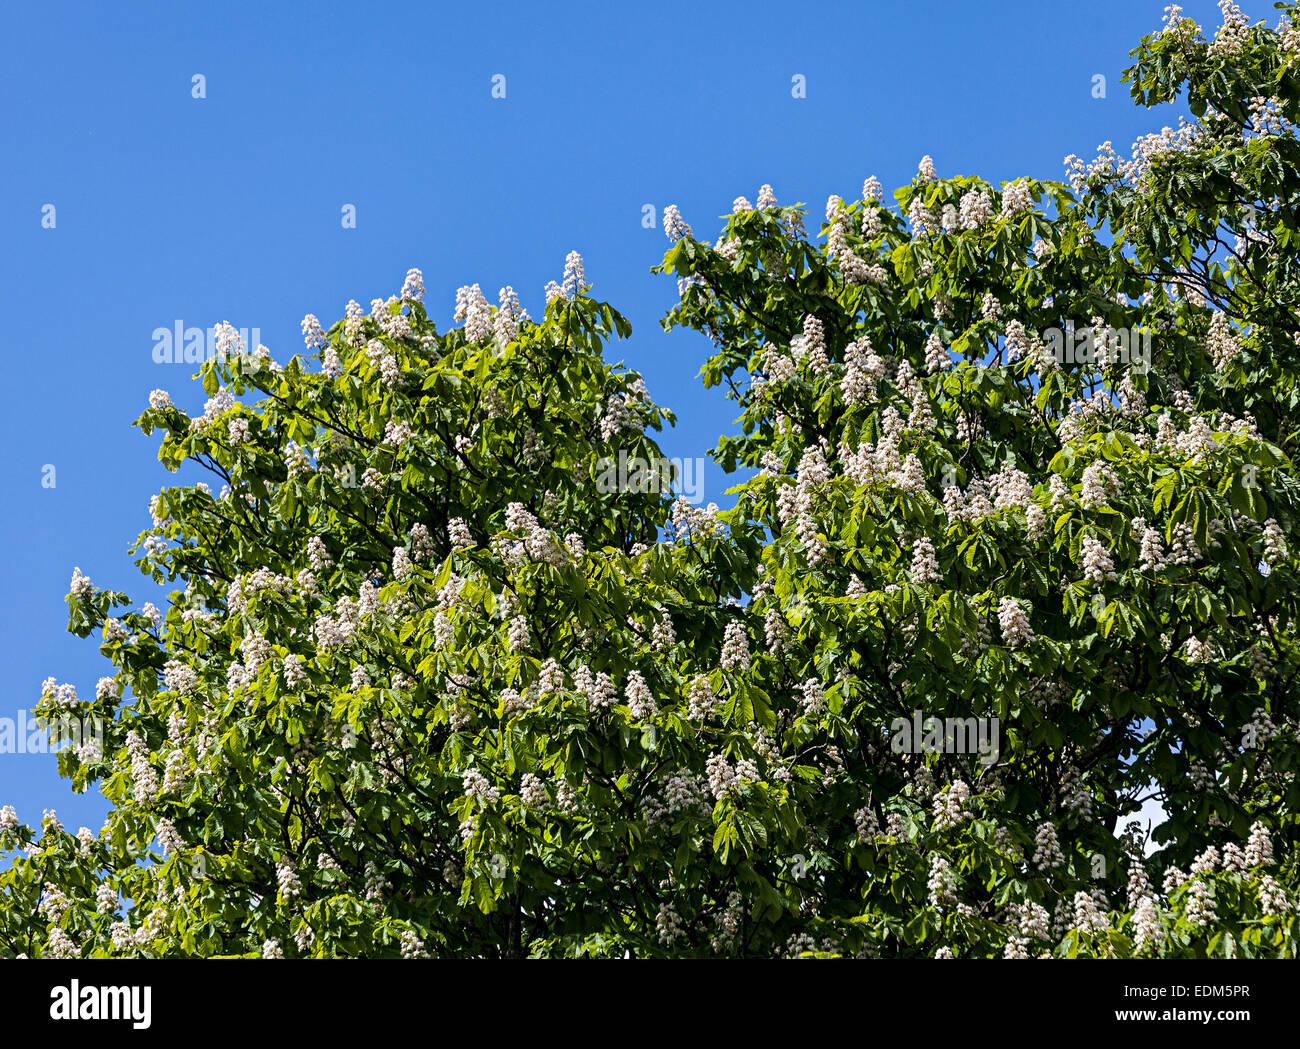 Horse chestnut Aesculus hippocastanum in flower, Abergavenny, Wales, UK - Stock Image